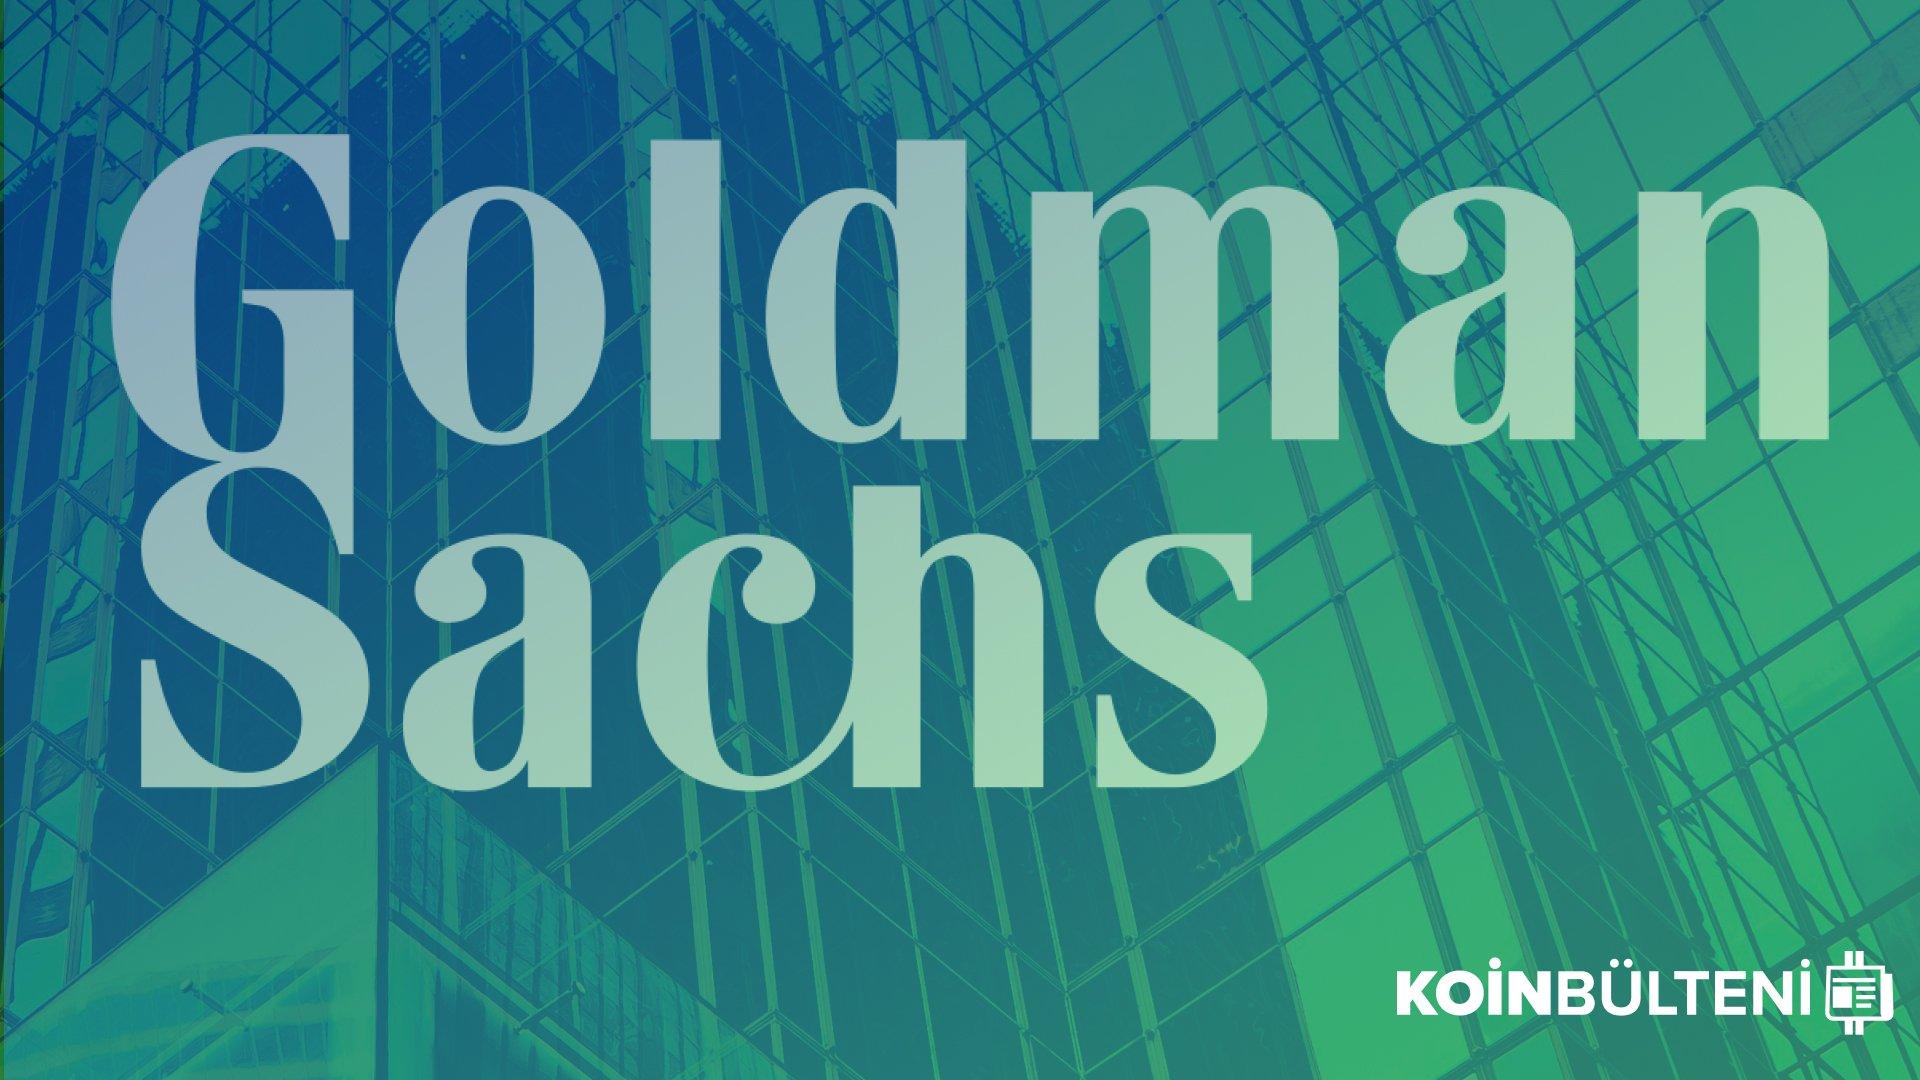 goldman-sachs-bitcoin-btc-kripto-para-dolar-usd-fiyat